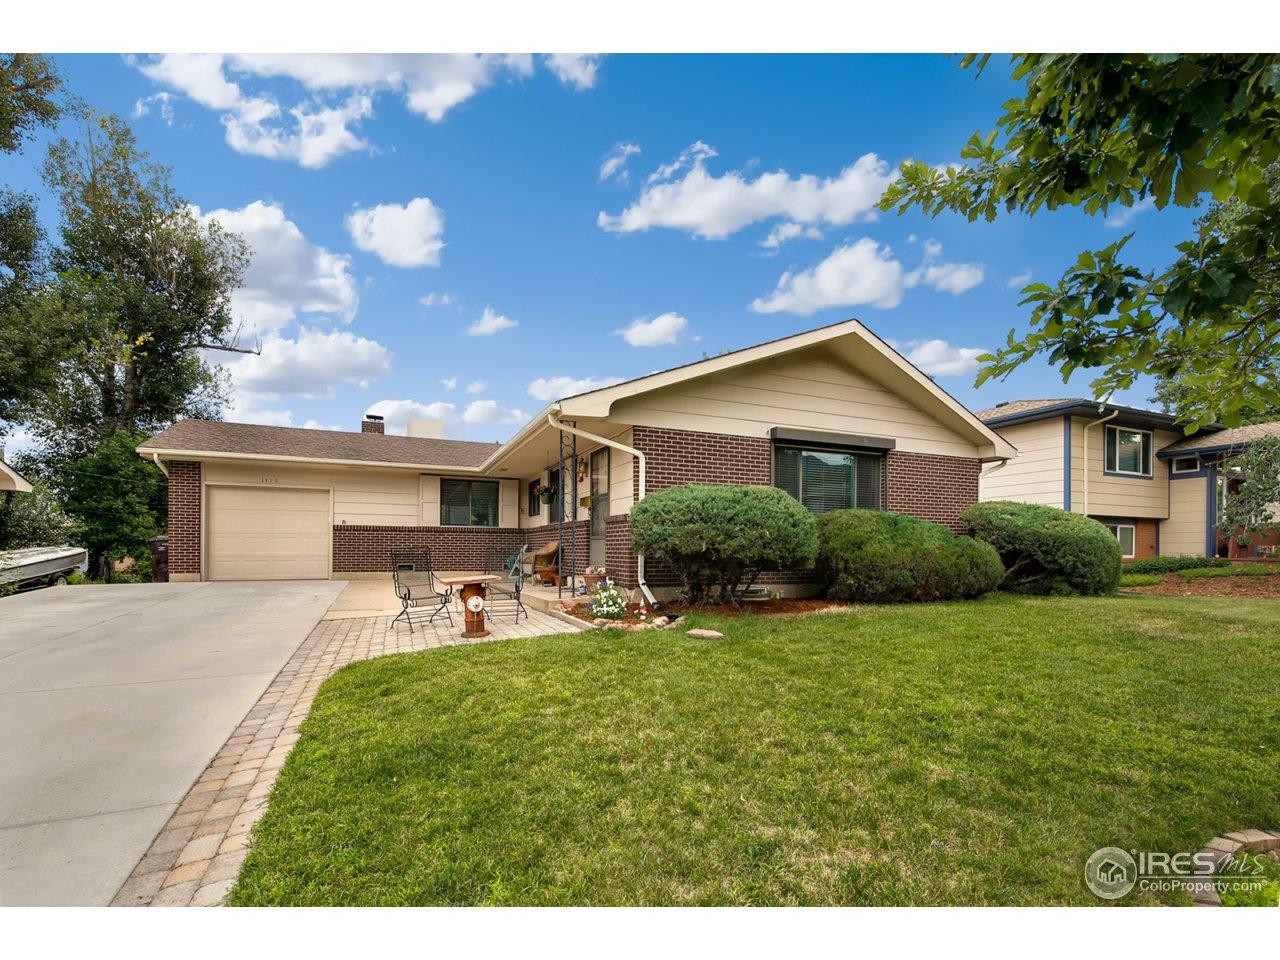 1170 Albion Rd, Boulder CO 80305